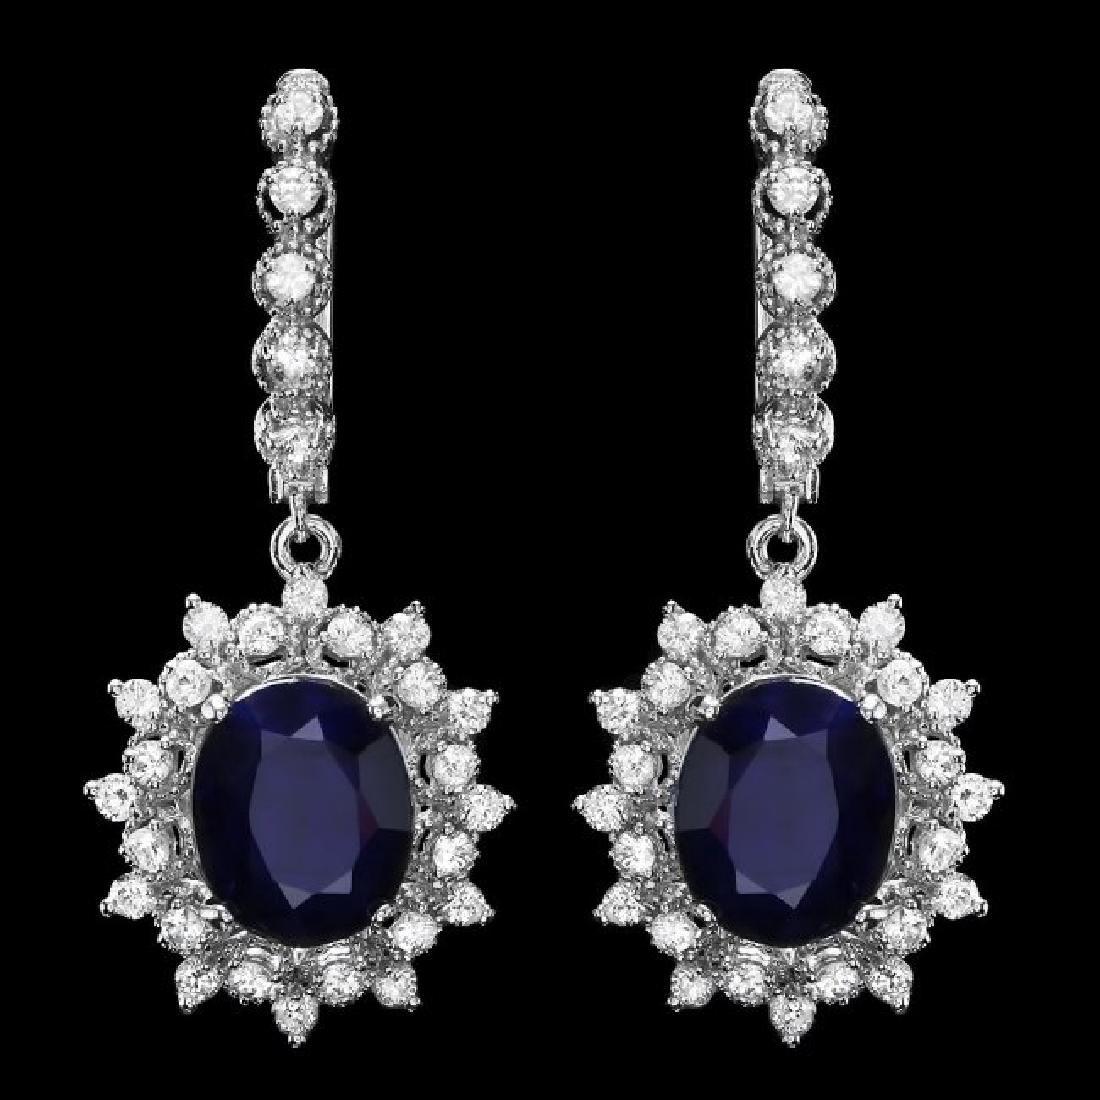 14k Gold 10.00ct Sapphire 1.90ct Diamond Earrings